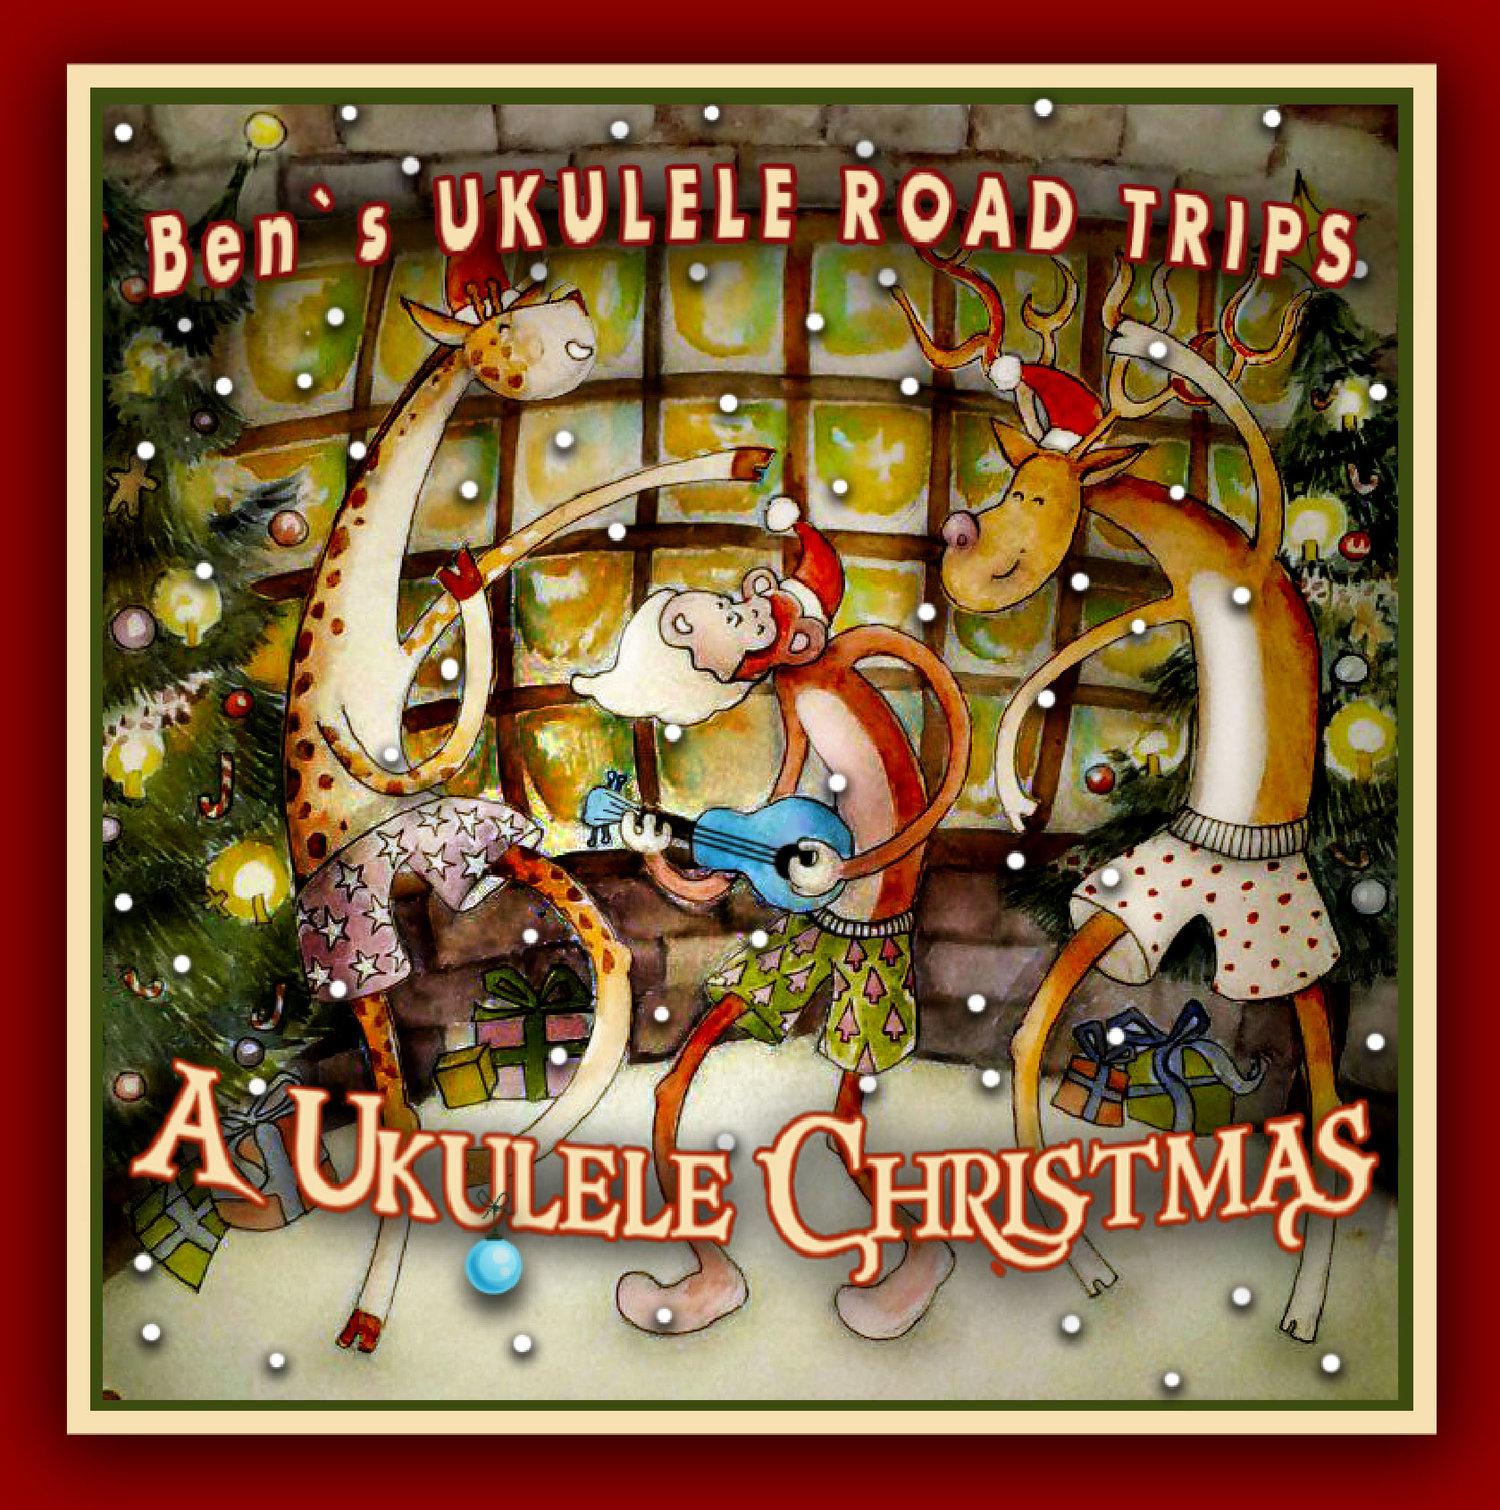 We Wish You A Merry Christmas Ukulele Chords.A Ukulele Christmas Ukulele Road Trips